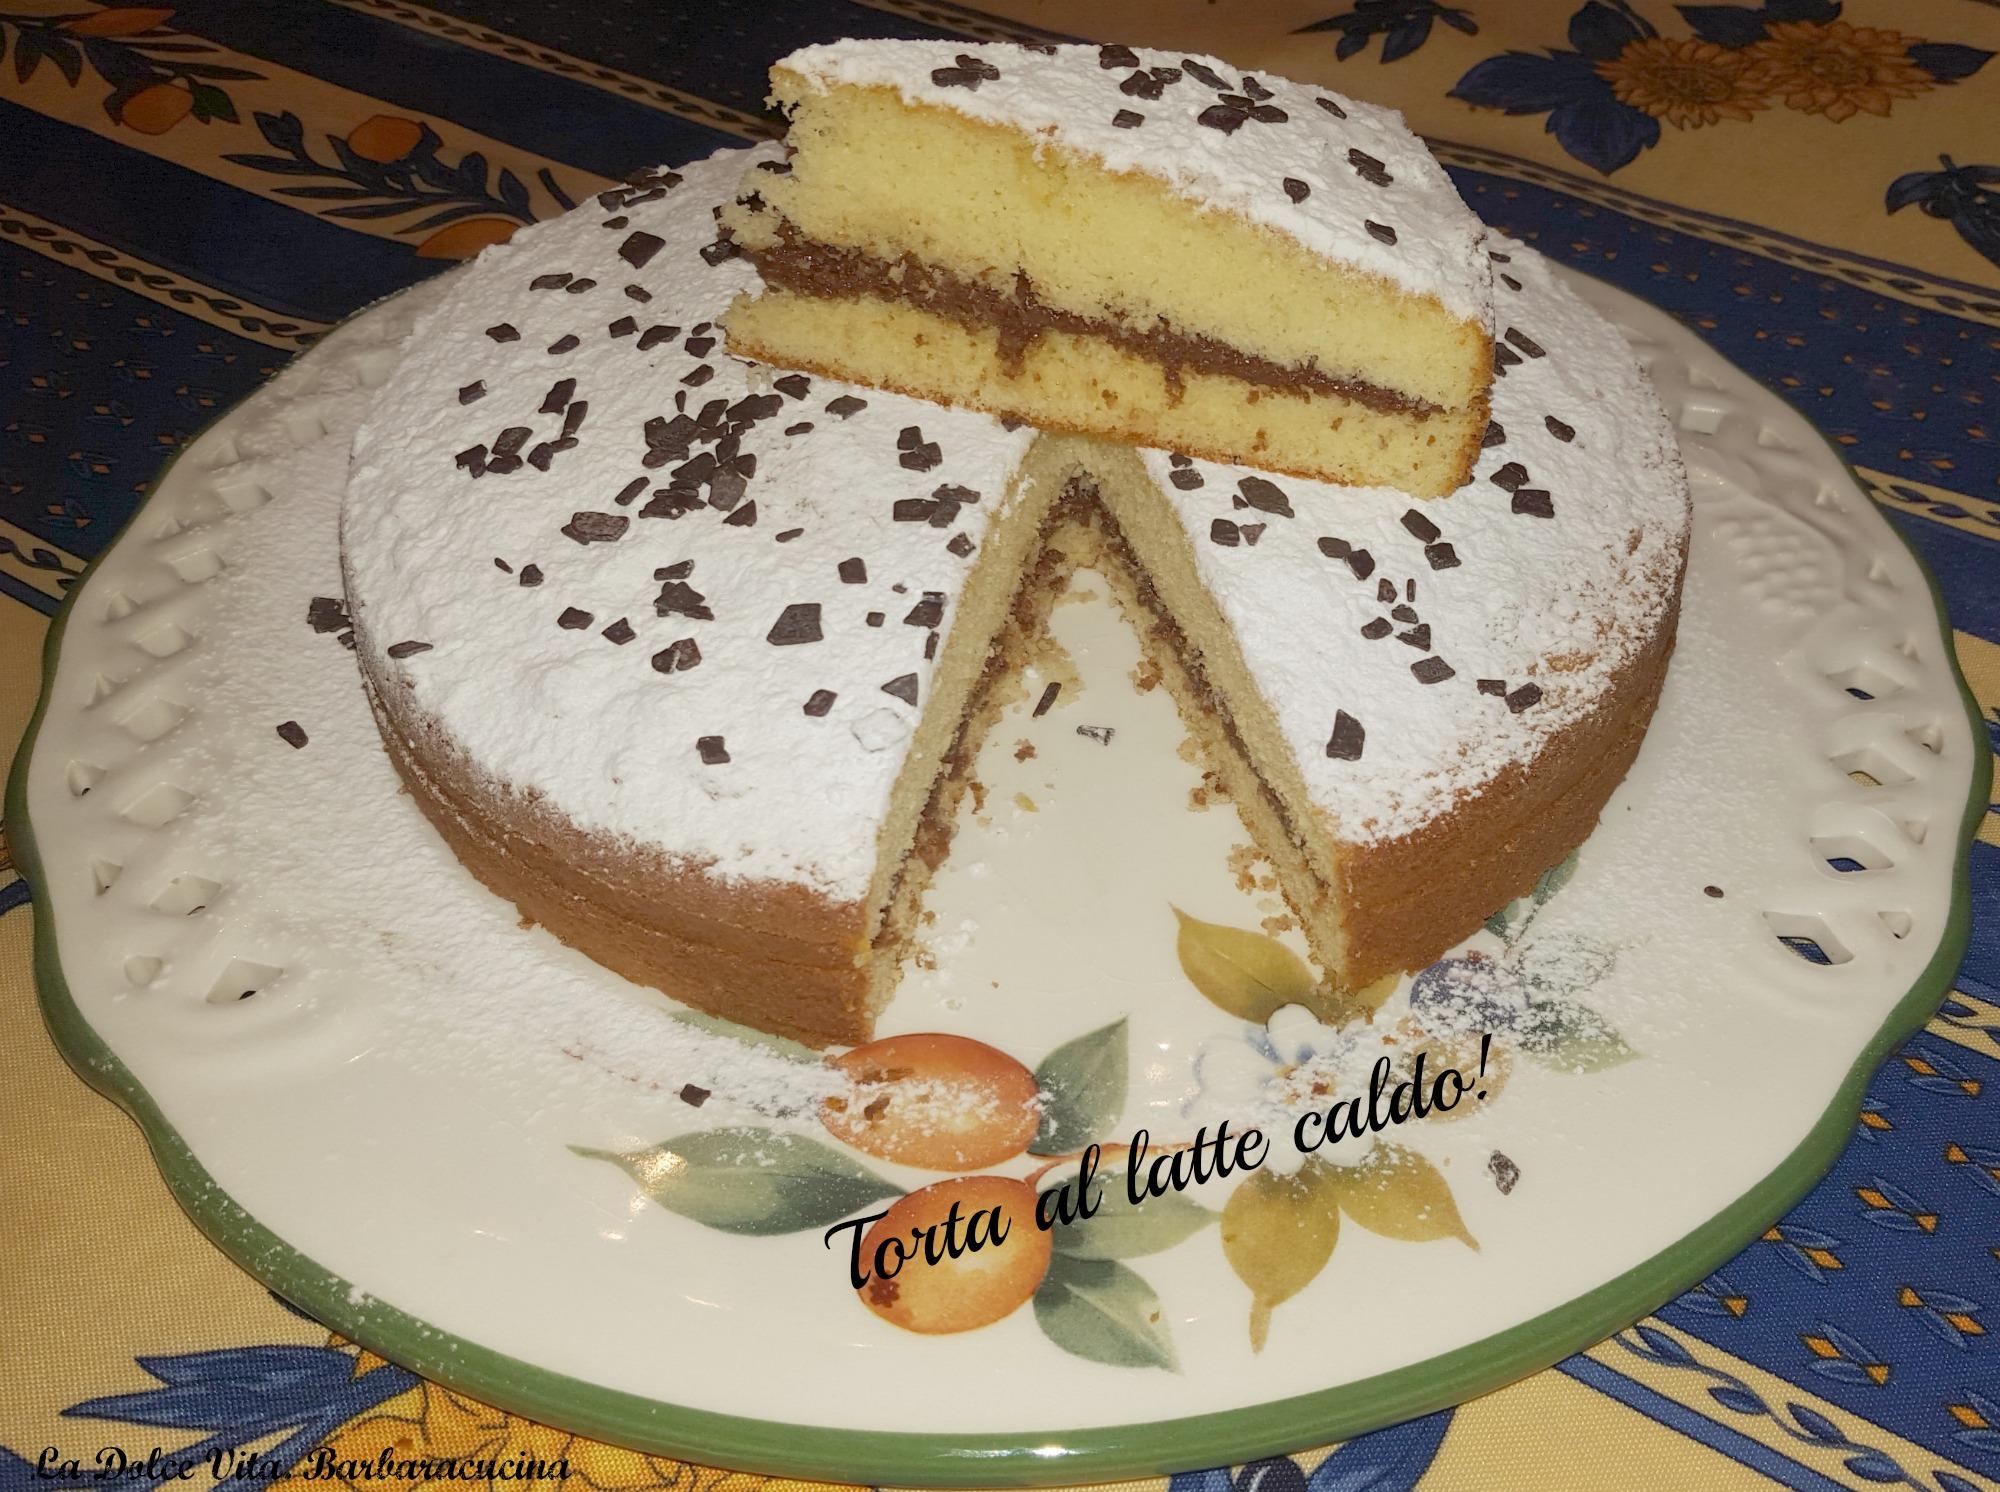 torta al latte caldo 3